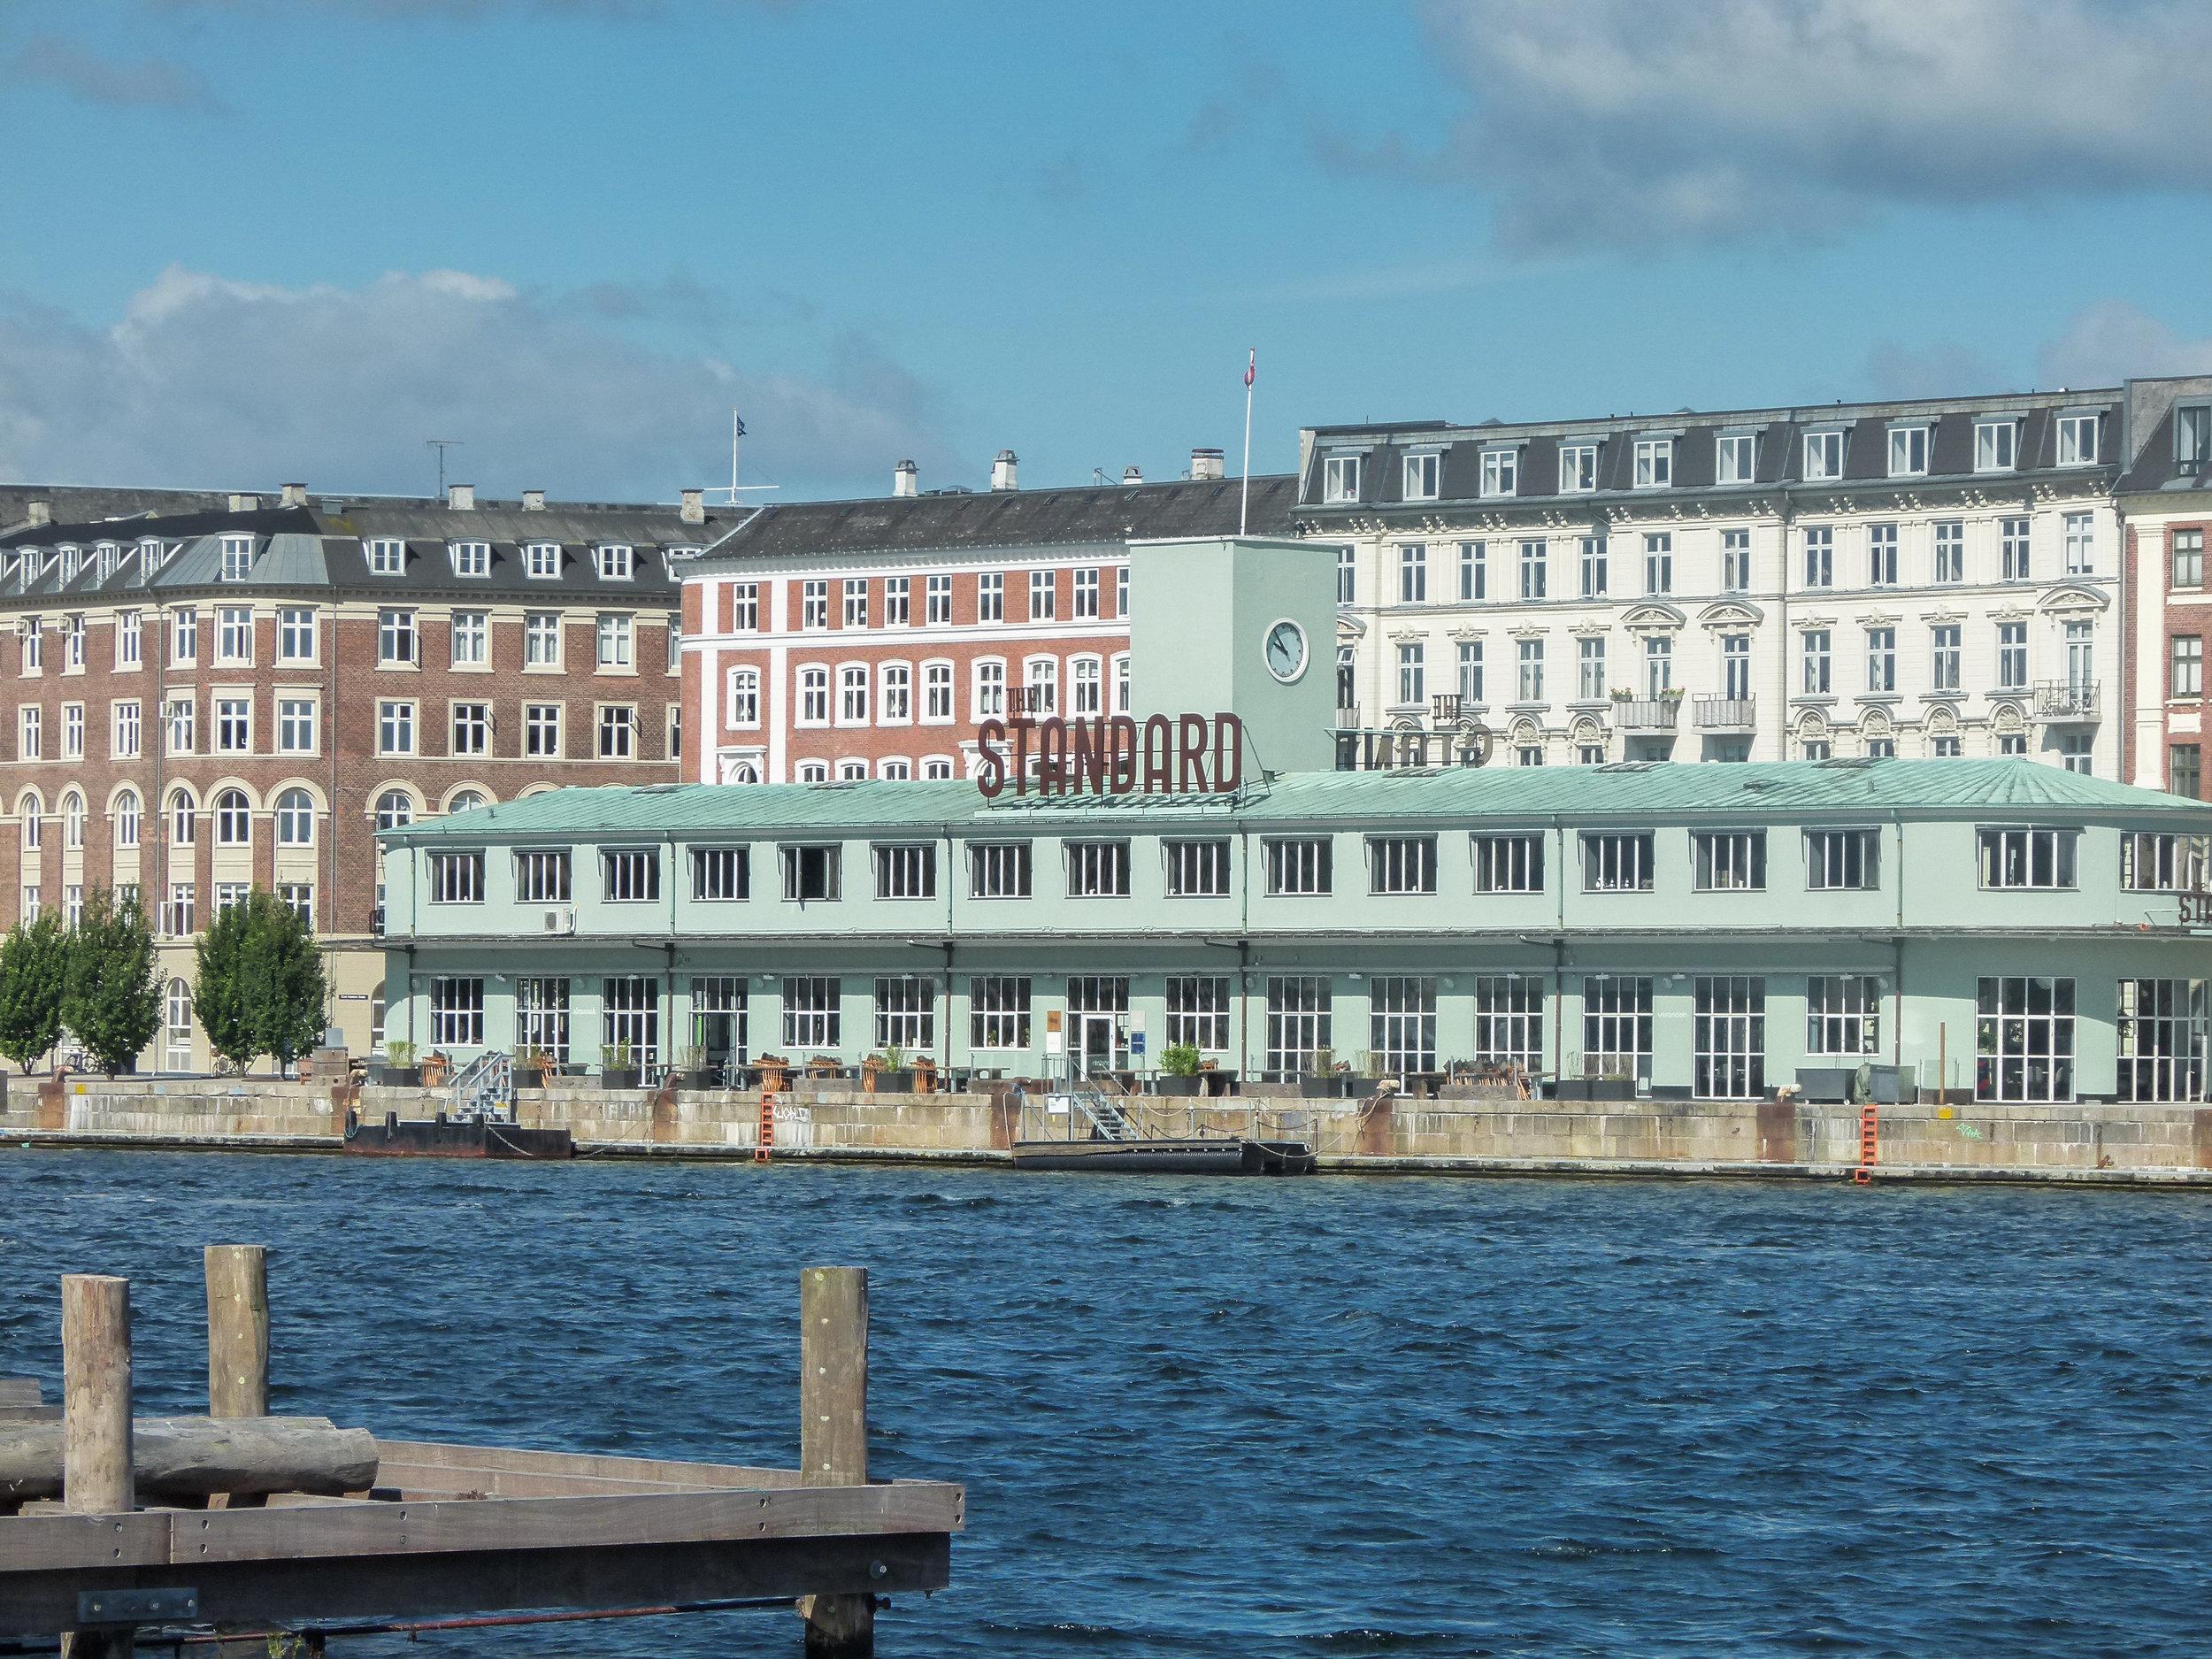 copenhagen boat sightseeing